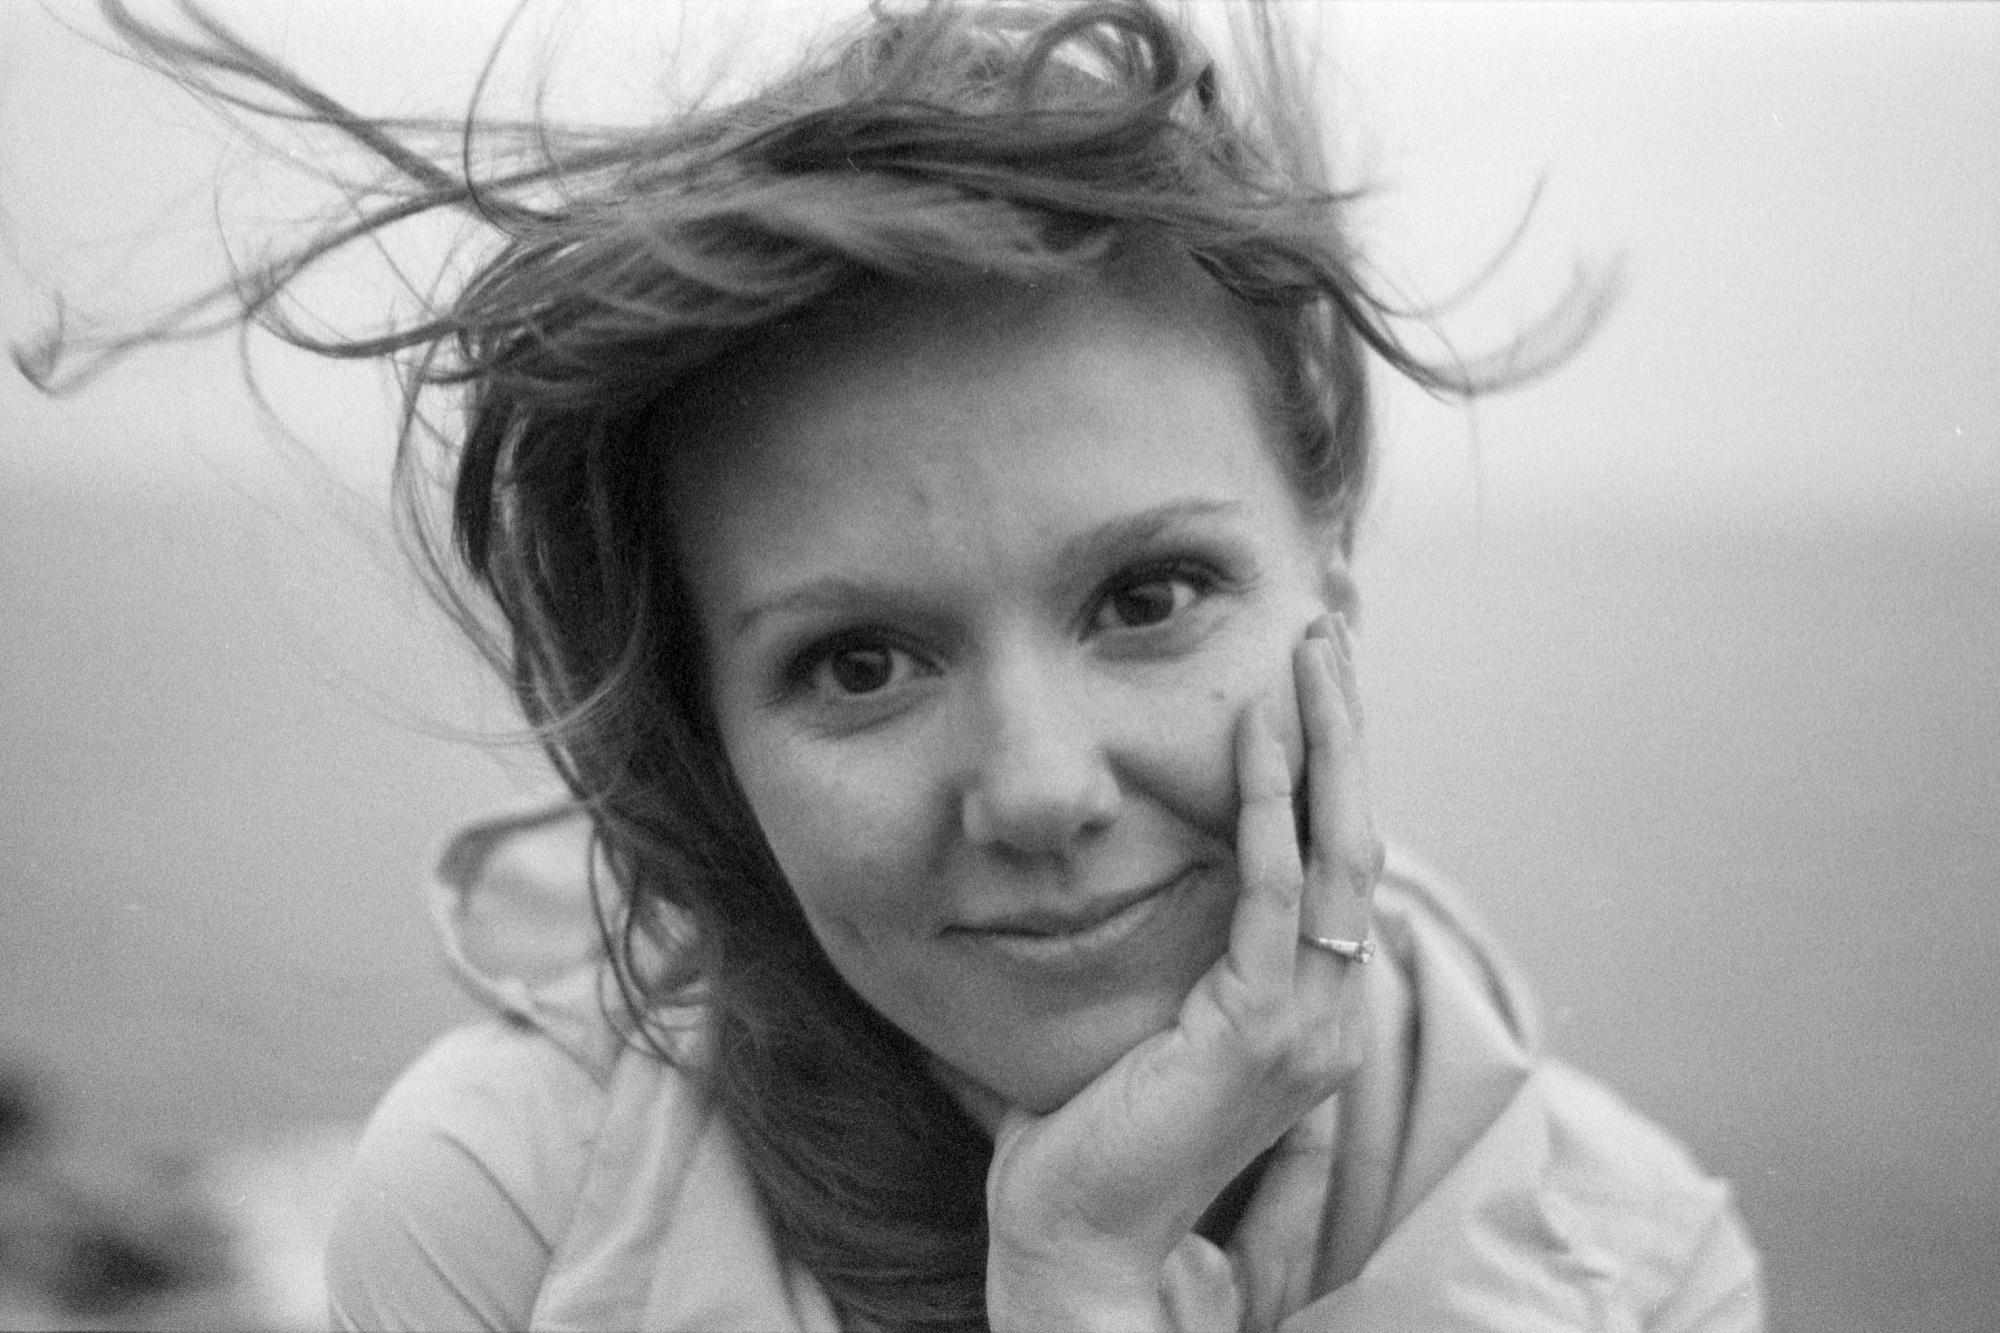 Jodi Gage, windblown hair, black and white photo